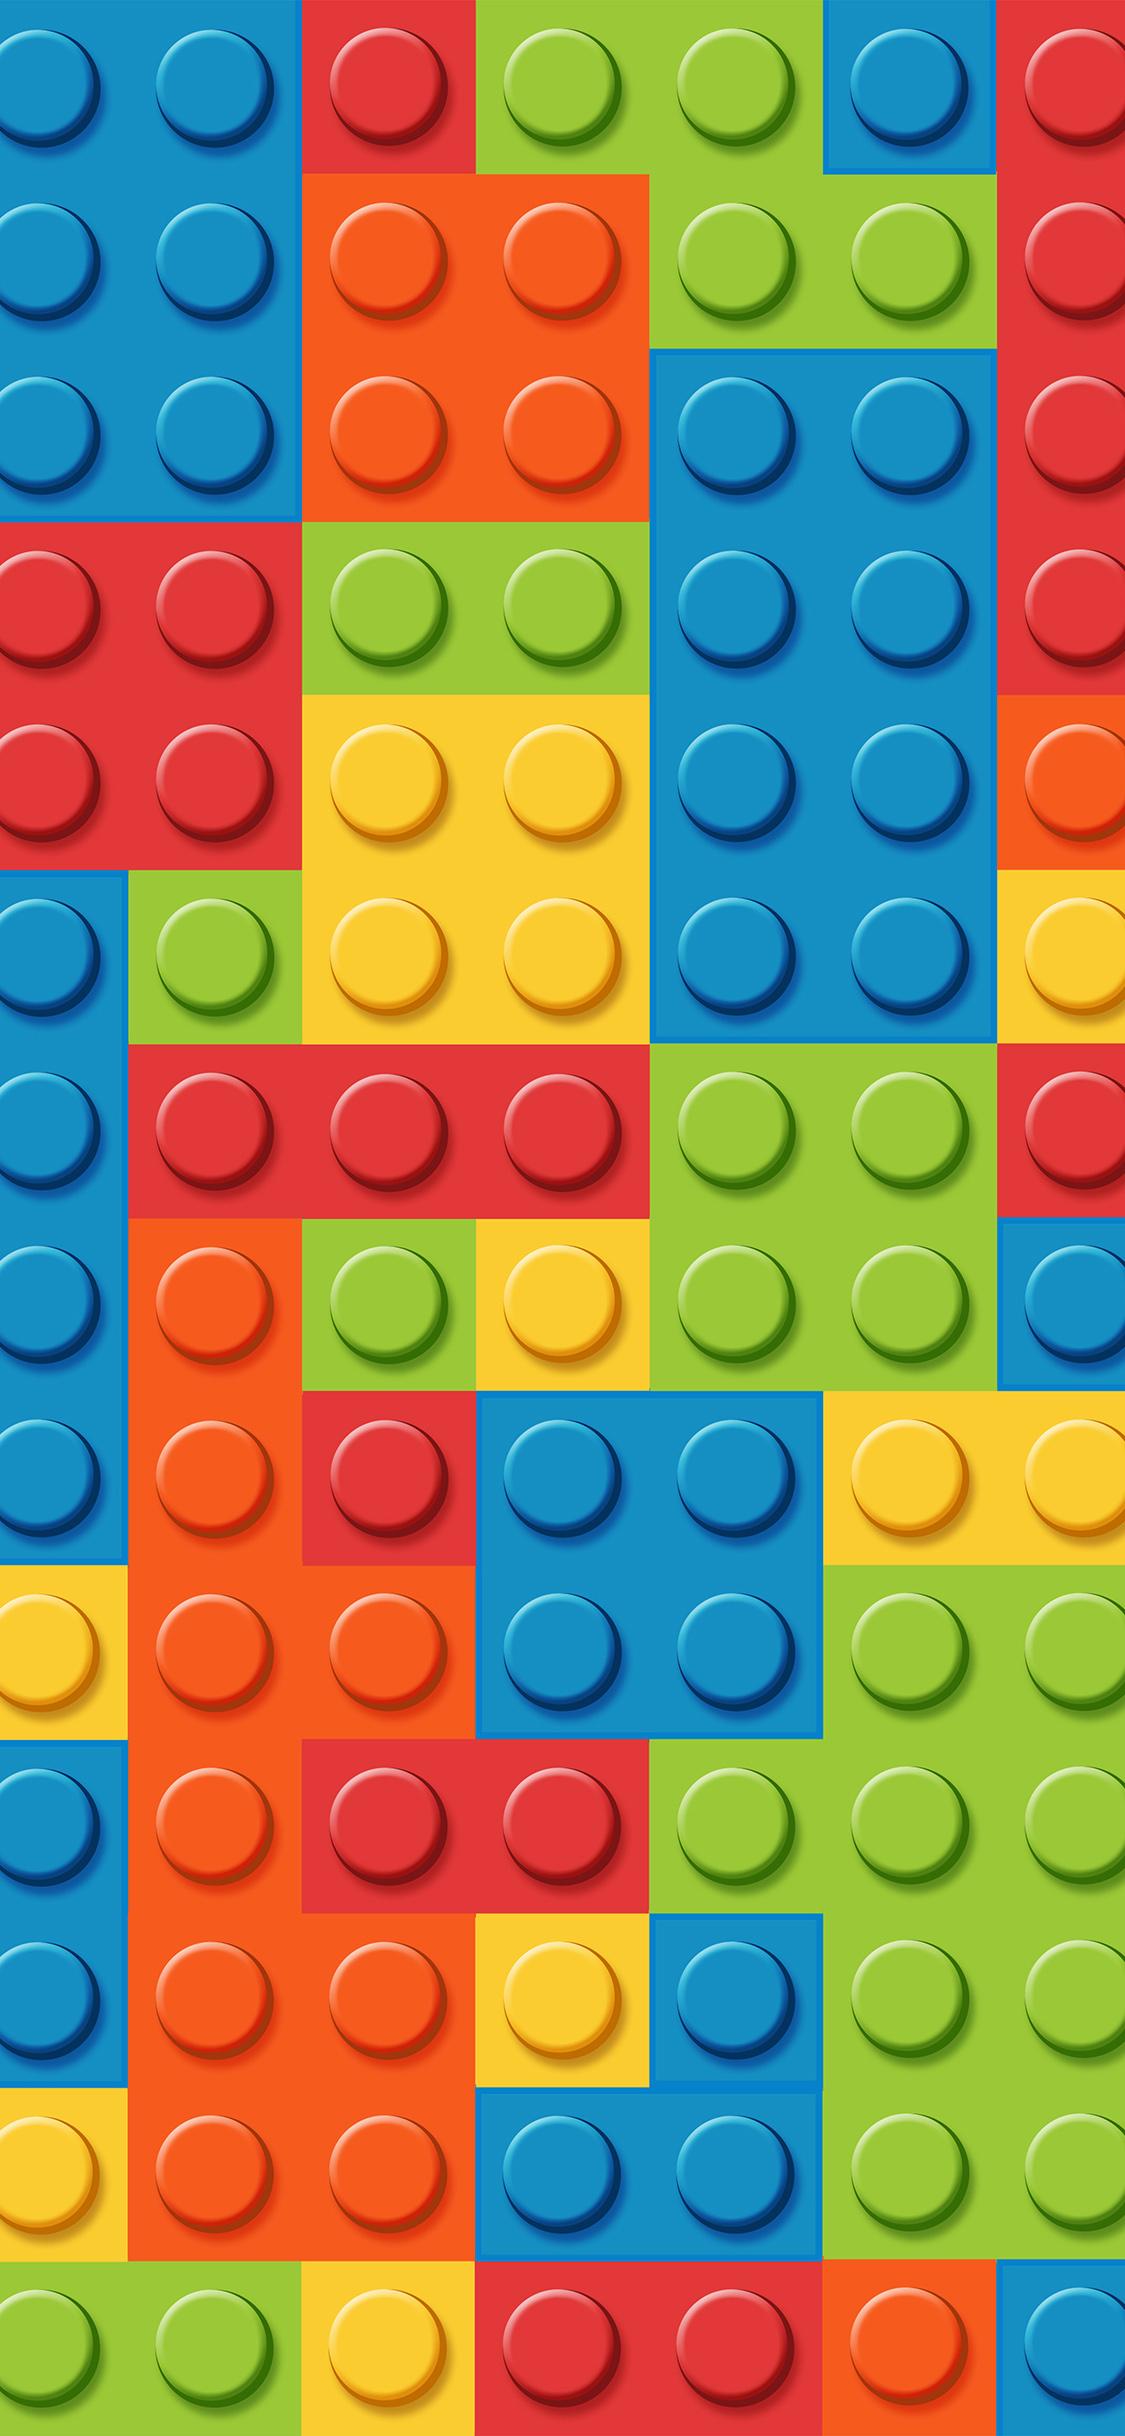 vo65-blocks-rainbow-lego-art-pattern-wallpaper